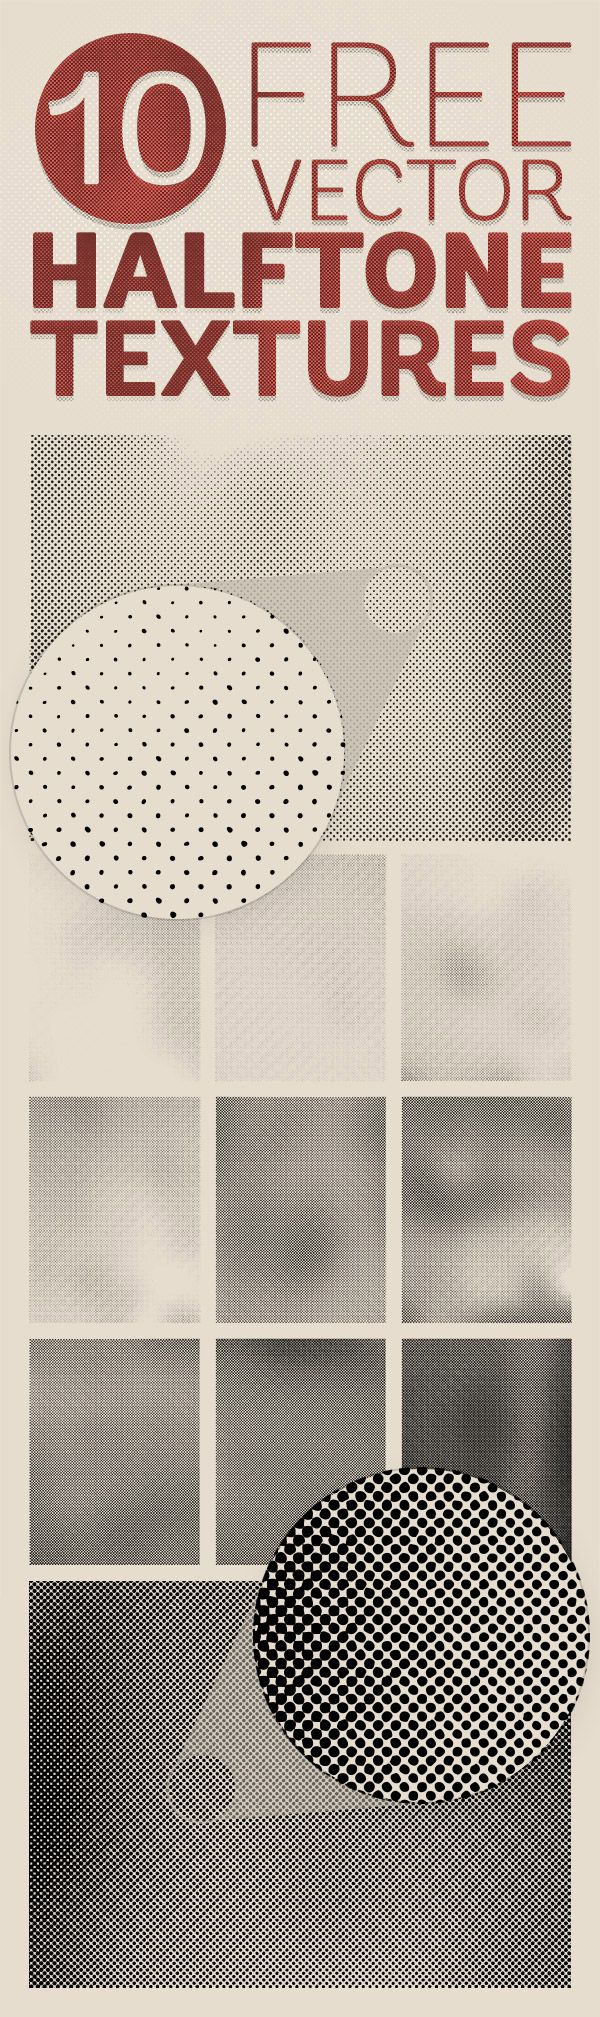 Free Vector Halftone Textures